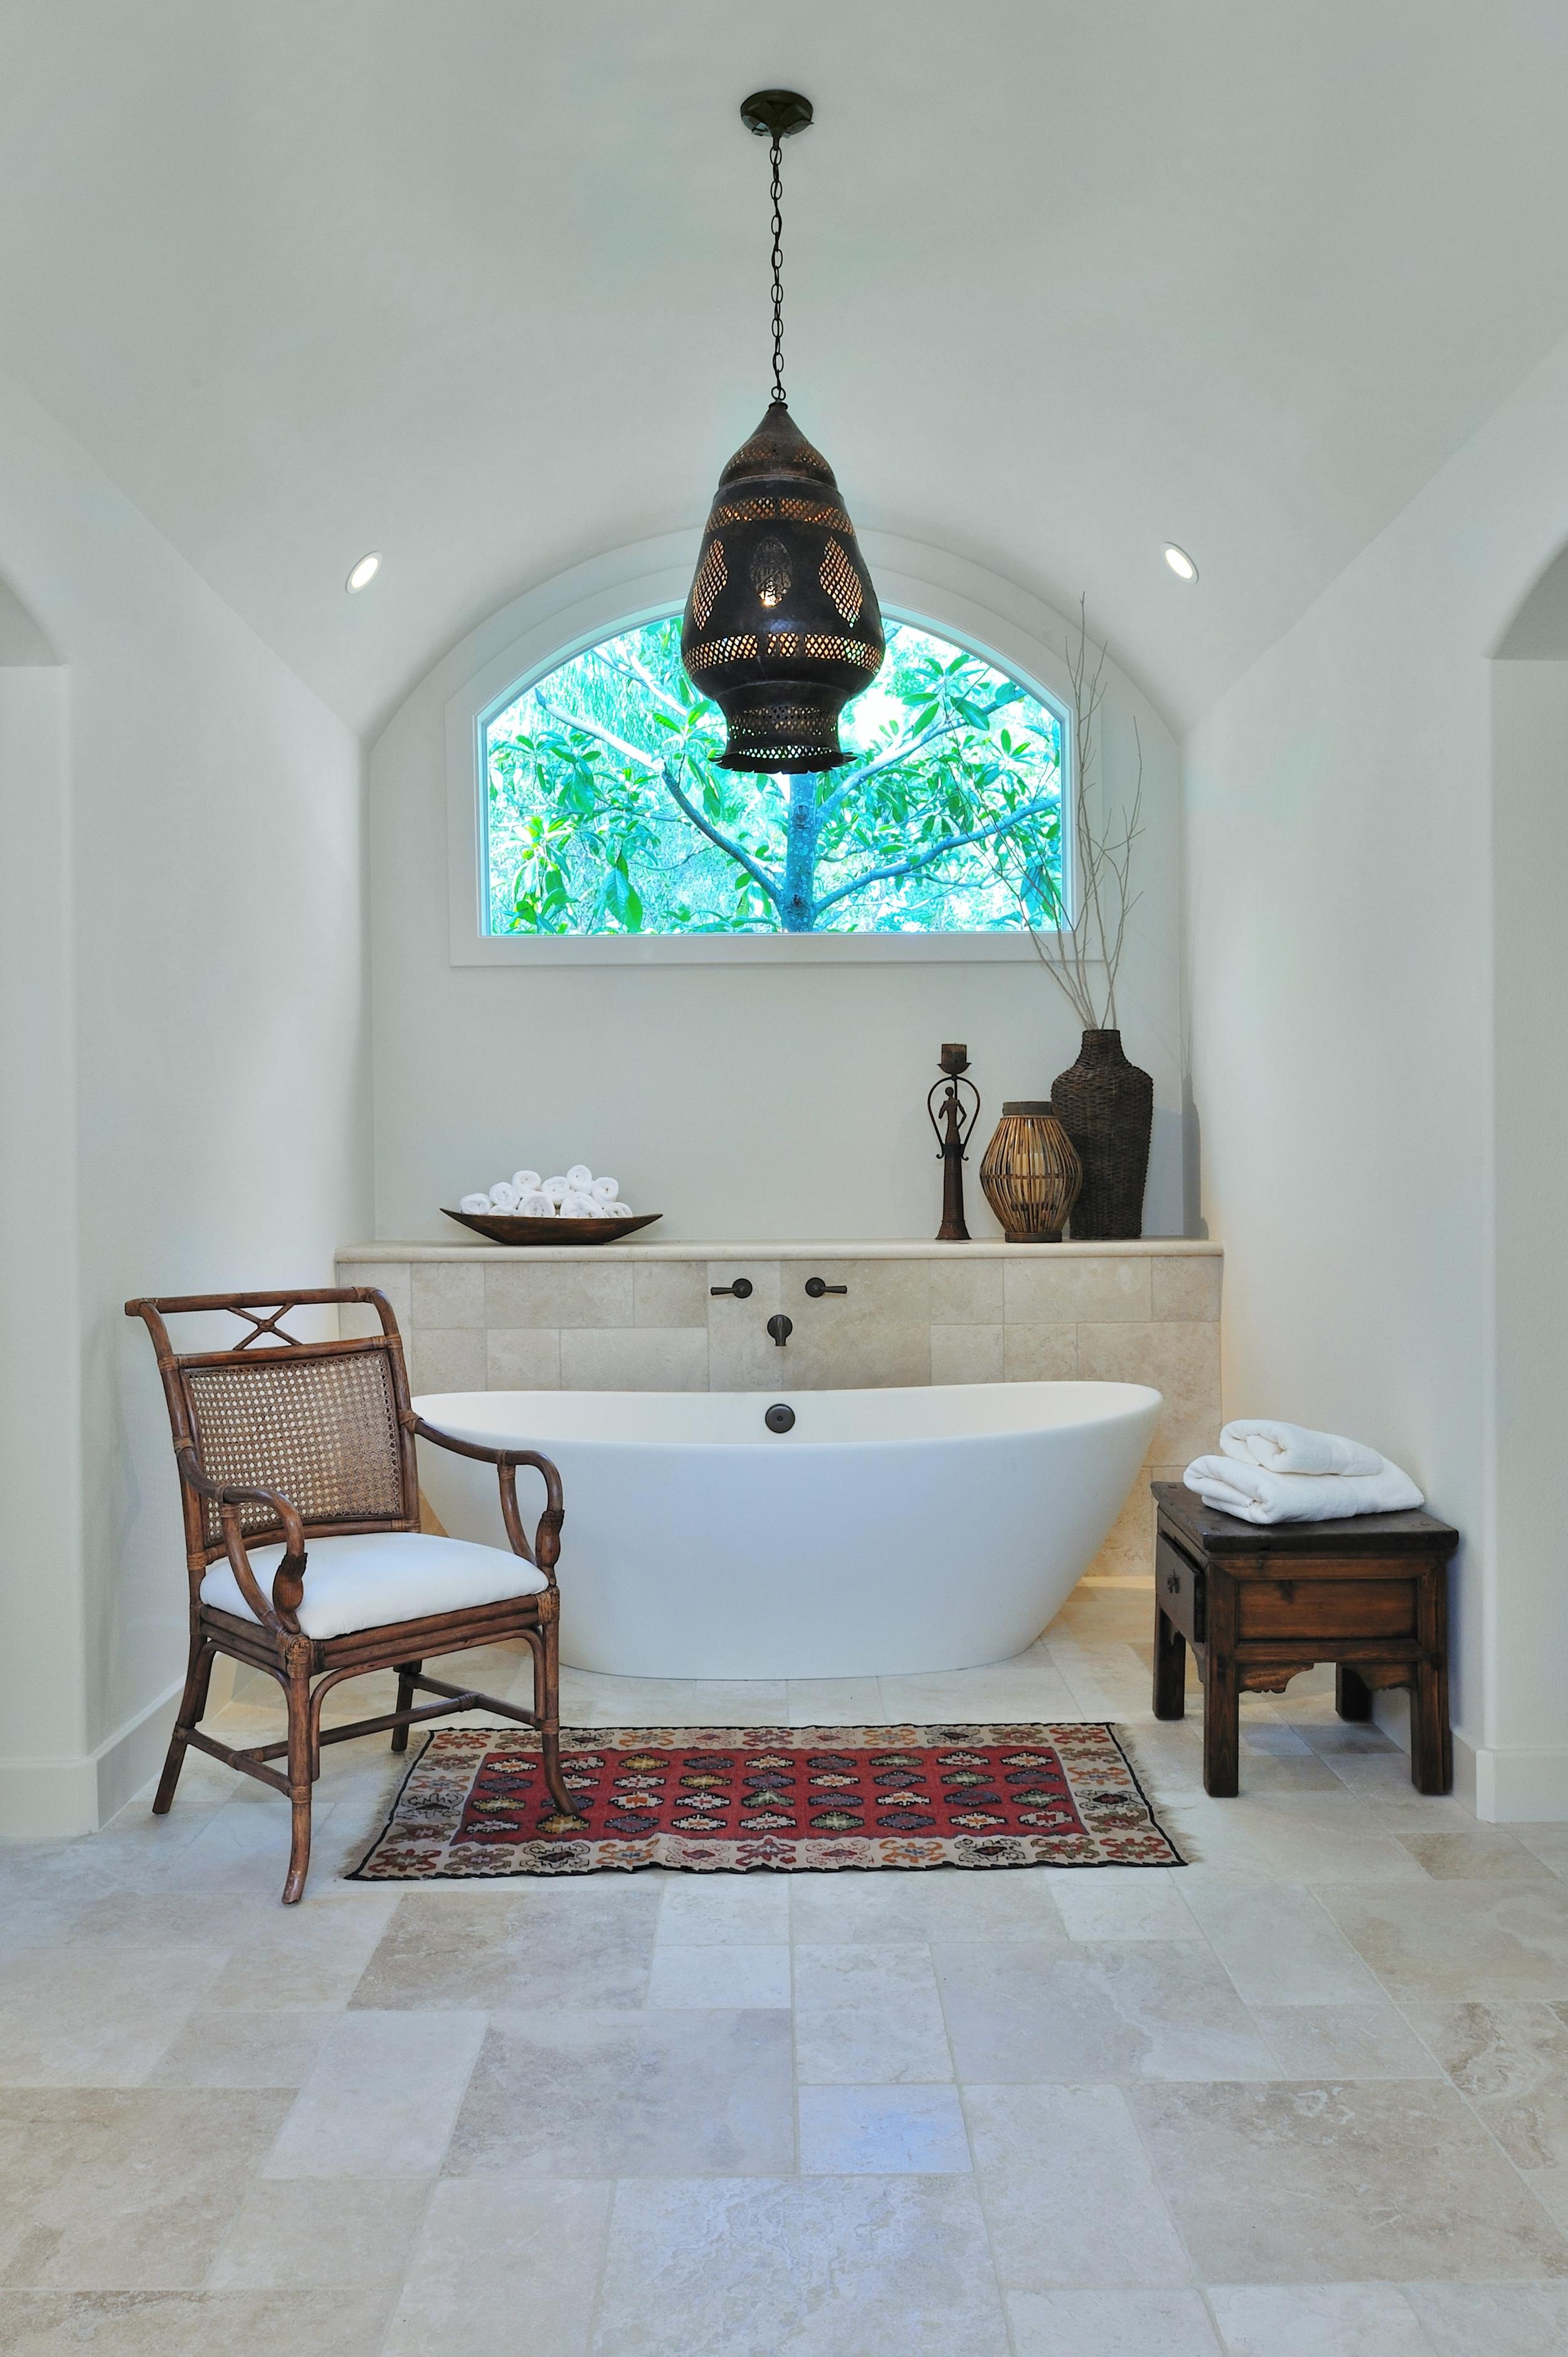 Bathroom Remodel: Designer, Carla Aston, Photographer: Miro Dvorscak